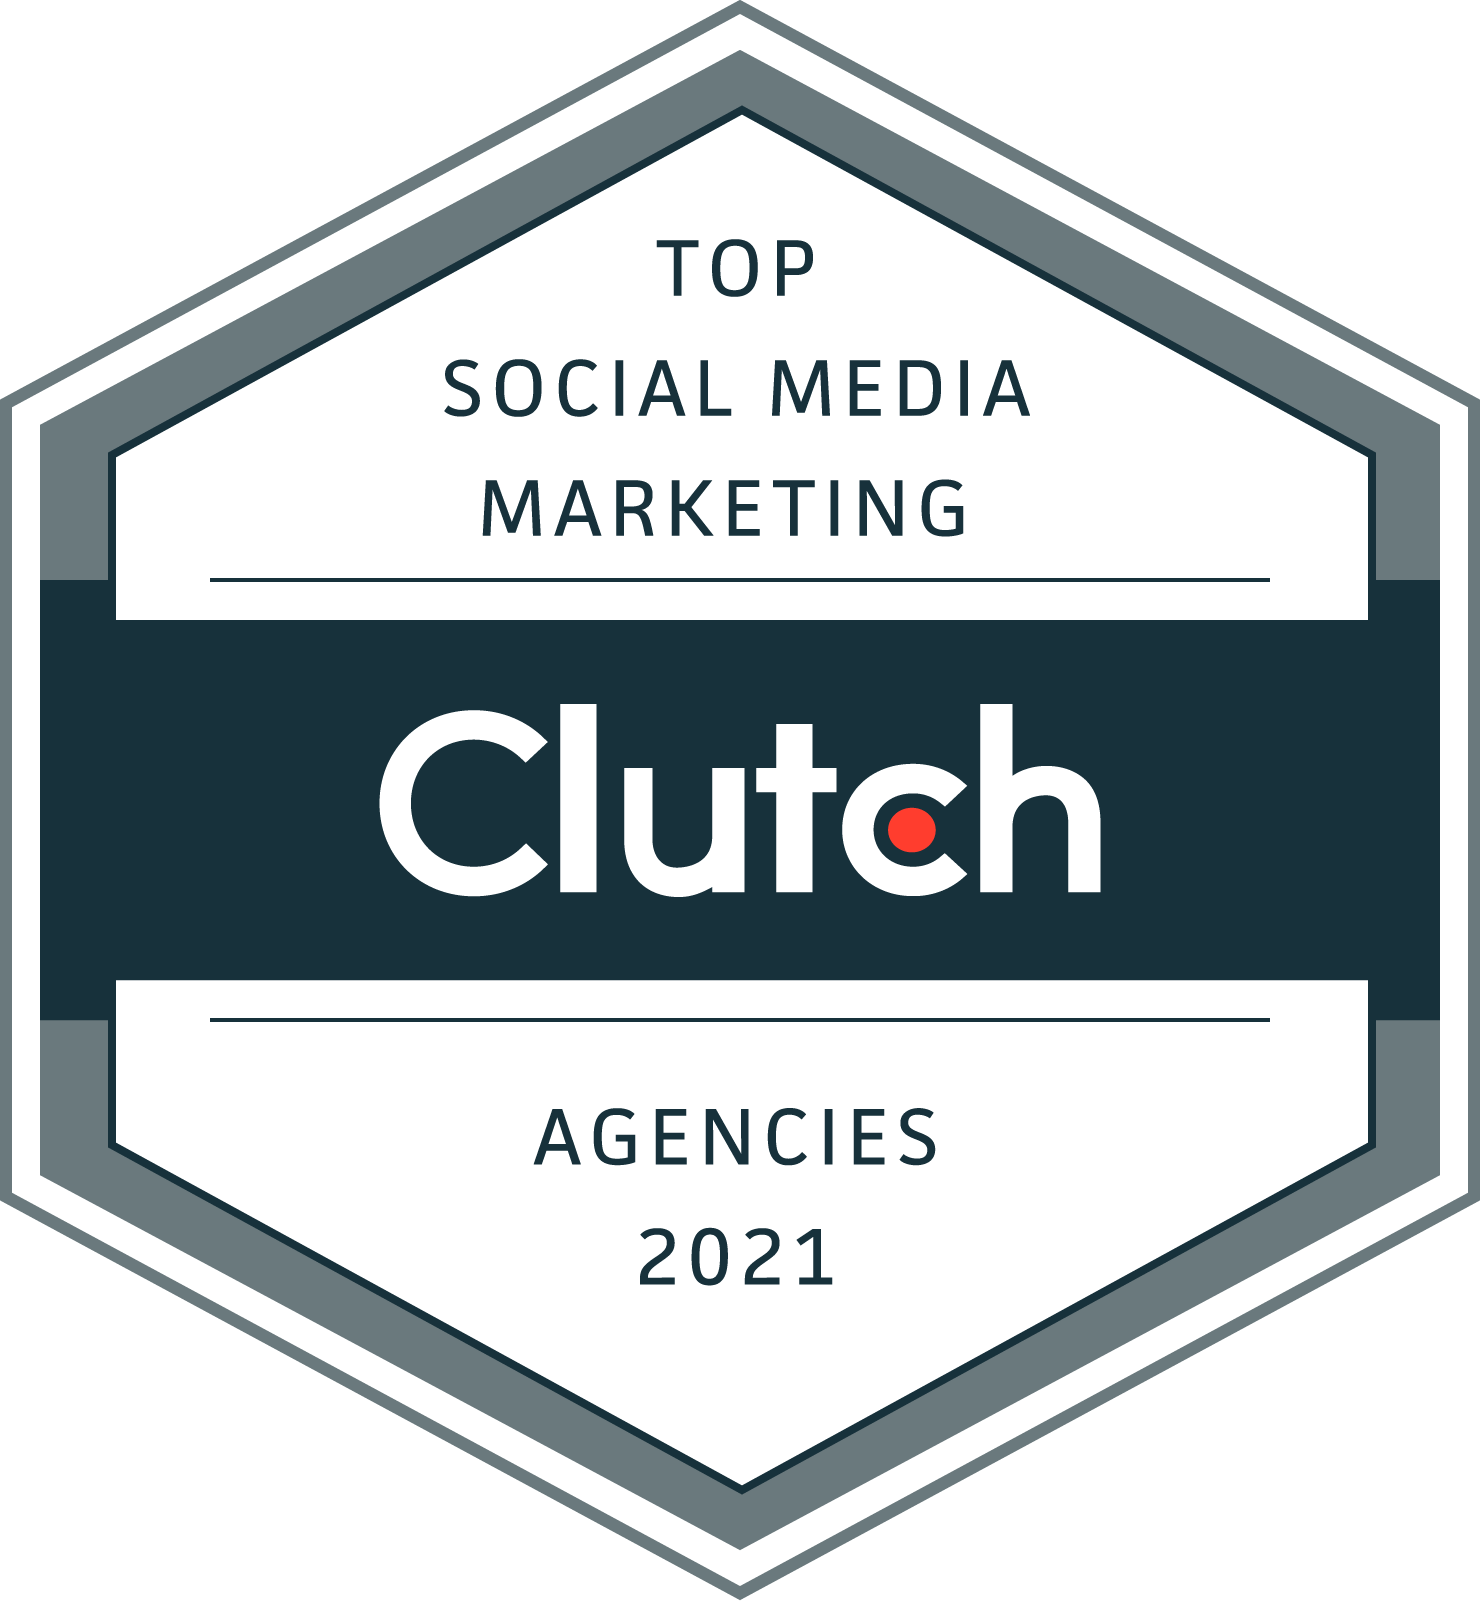 Top Social Media Marketing 2021 by Clutch